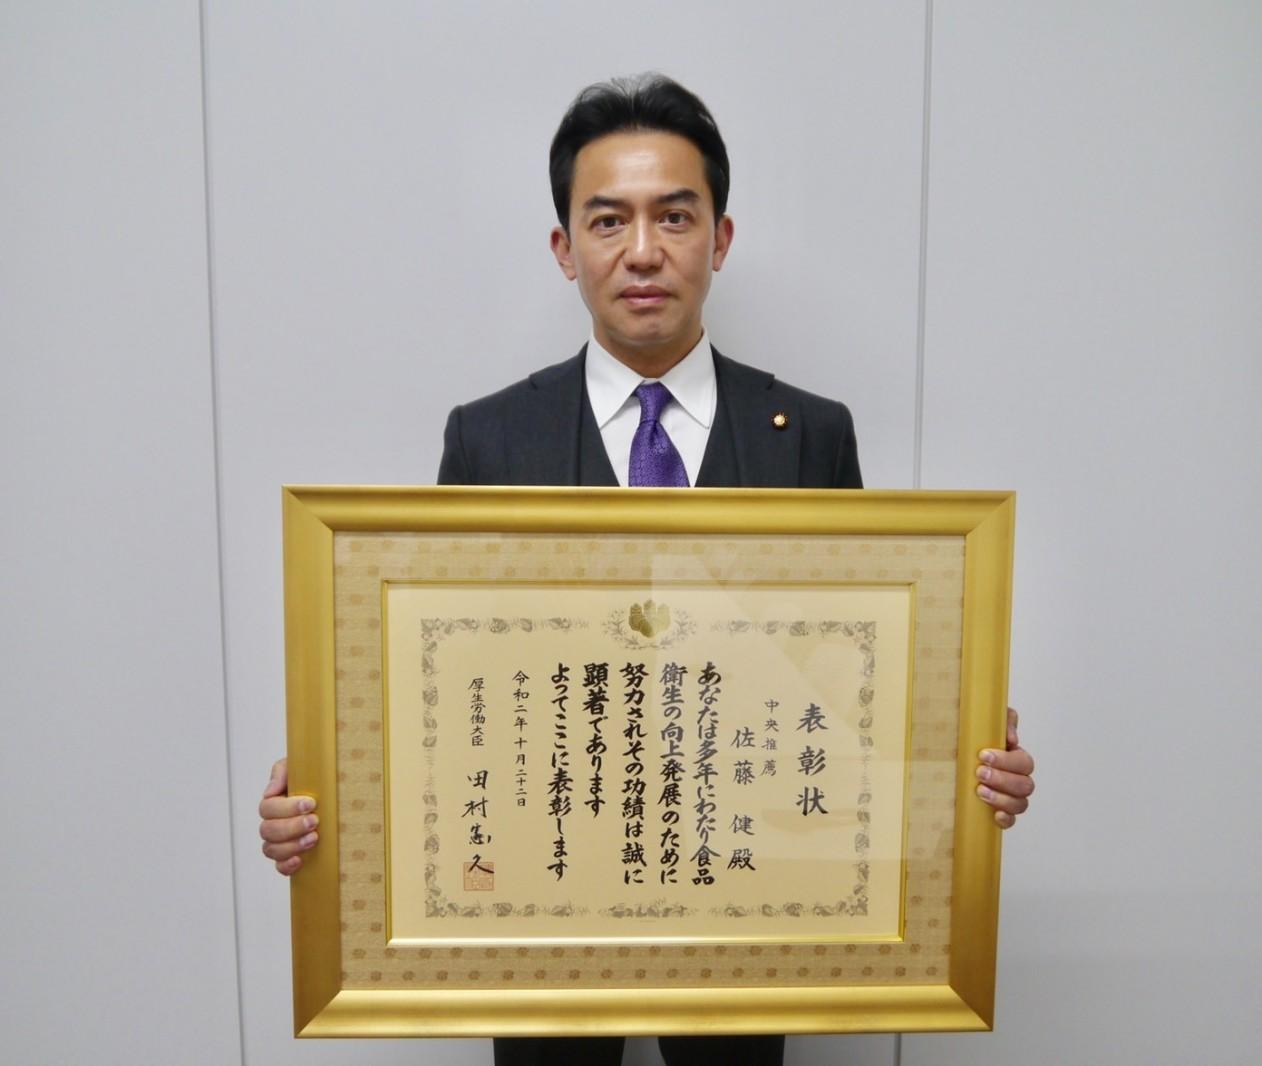 SL Creations 佐藤社長が食品衛生功労者表彰 冷凍食品宅配で食品衛生に貢献、Z's MENUでは「食品産業技術功労賞」